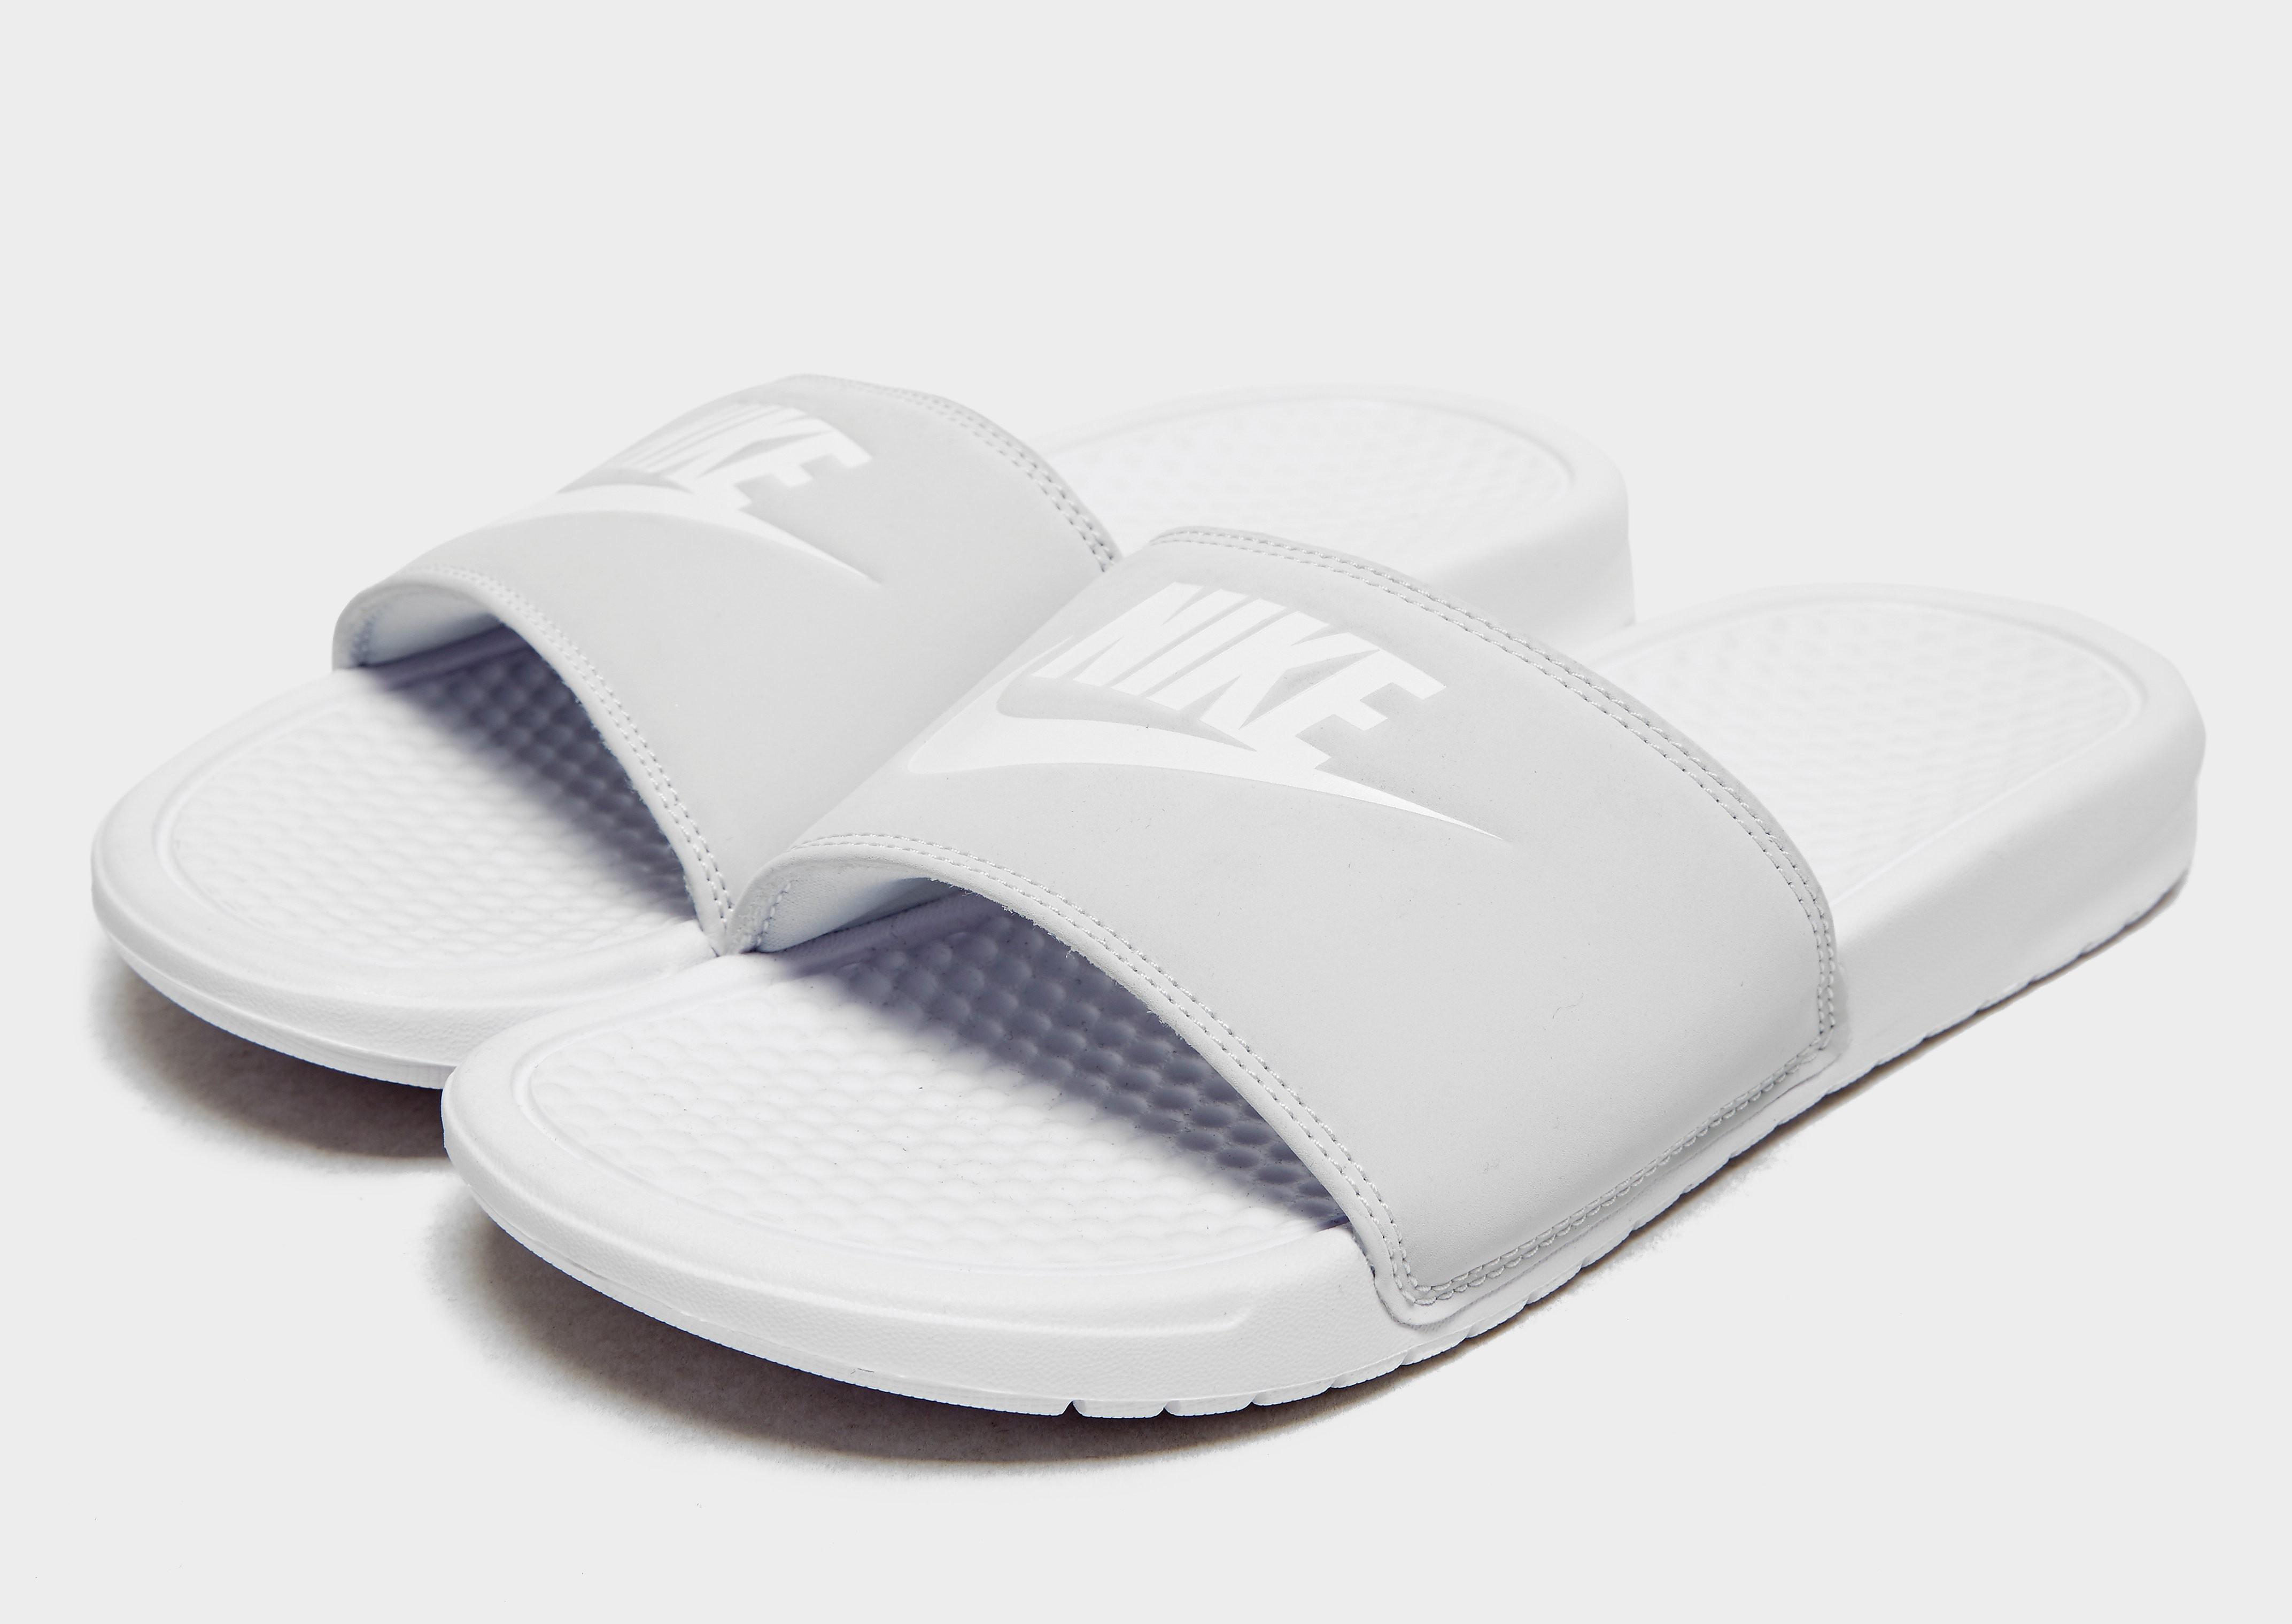 Nike Benassi Women's